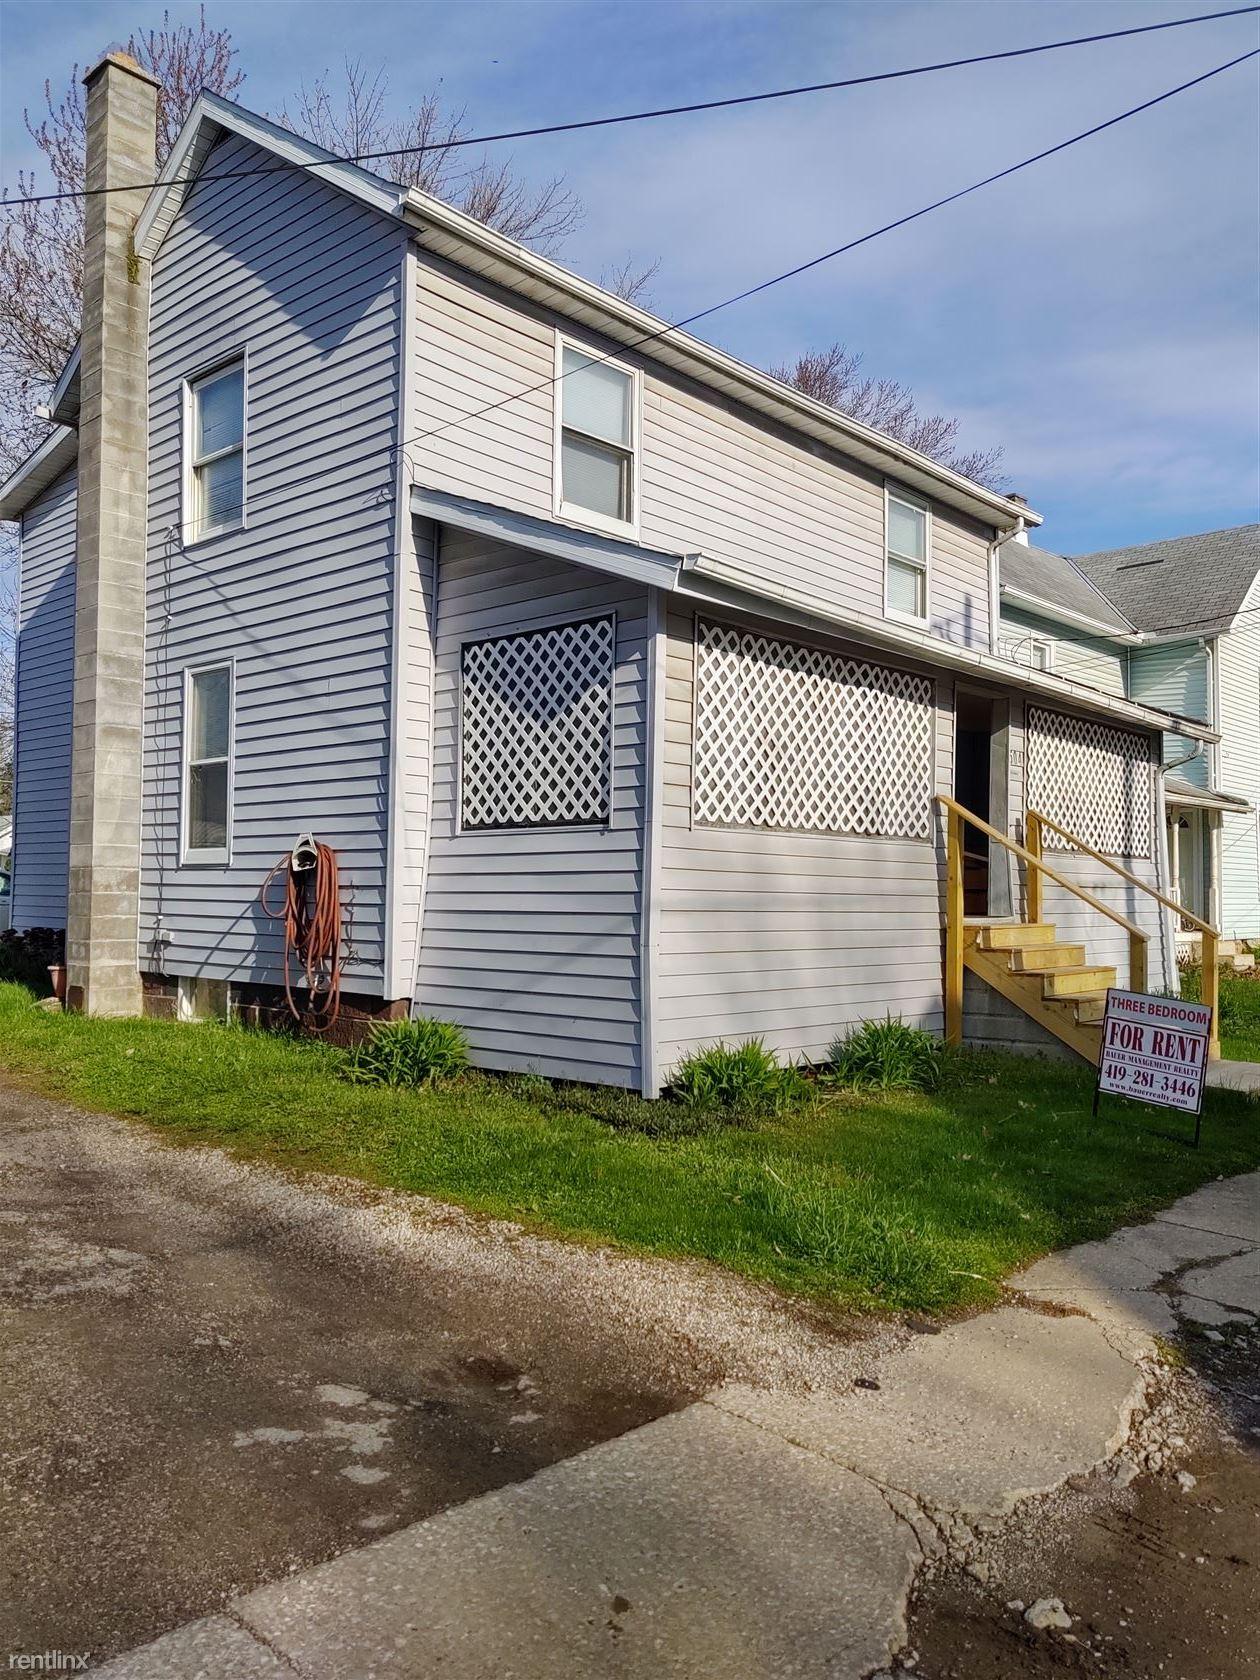 504 Buckeye St, Ashland, OH - $649